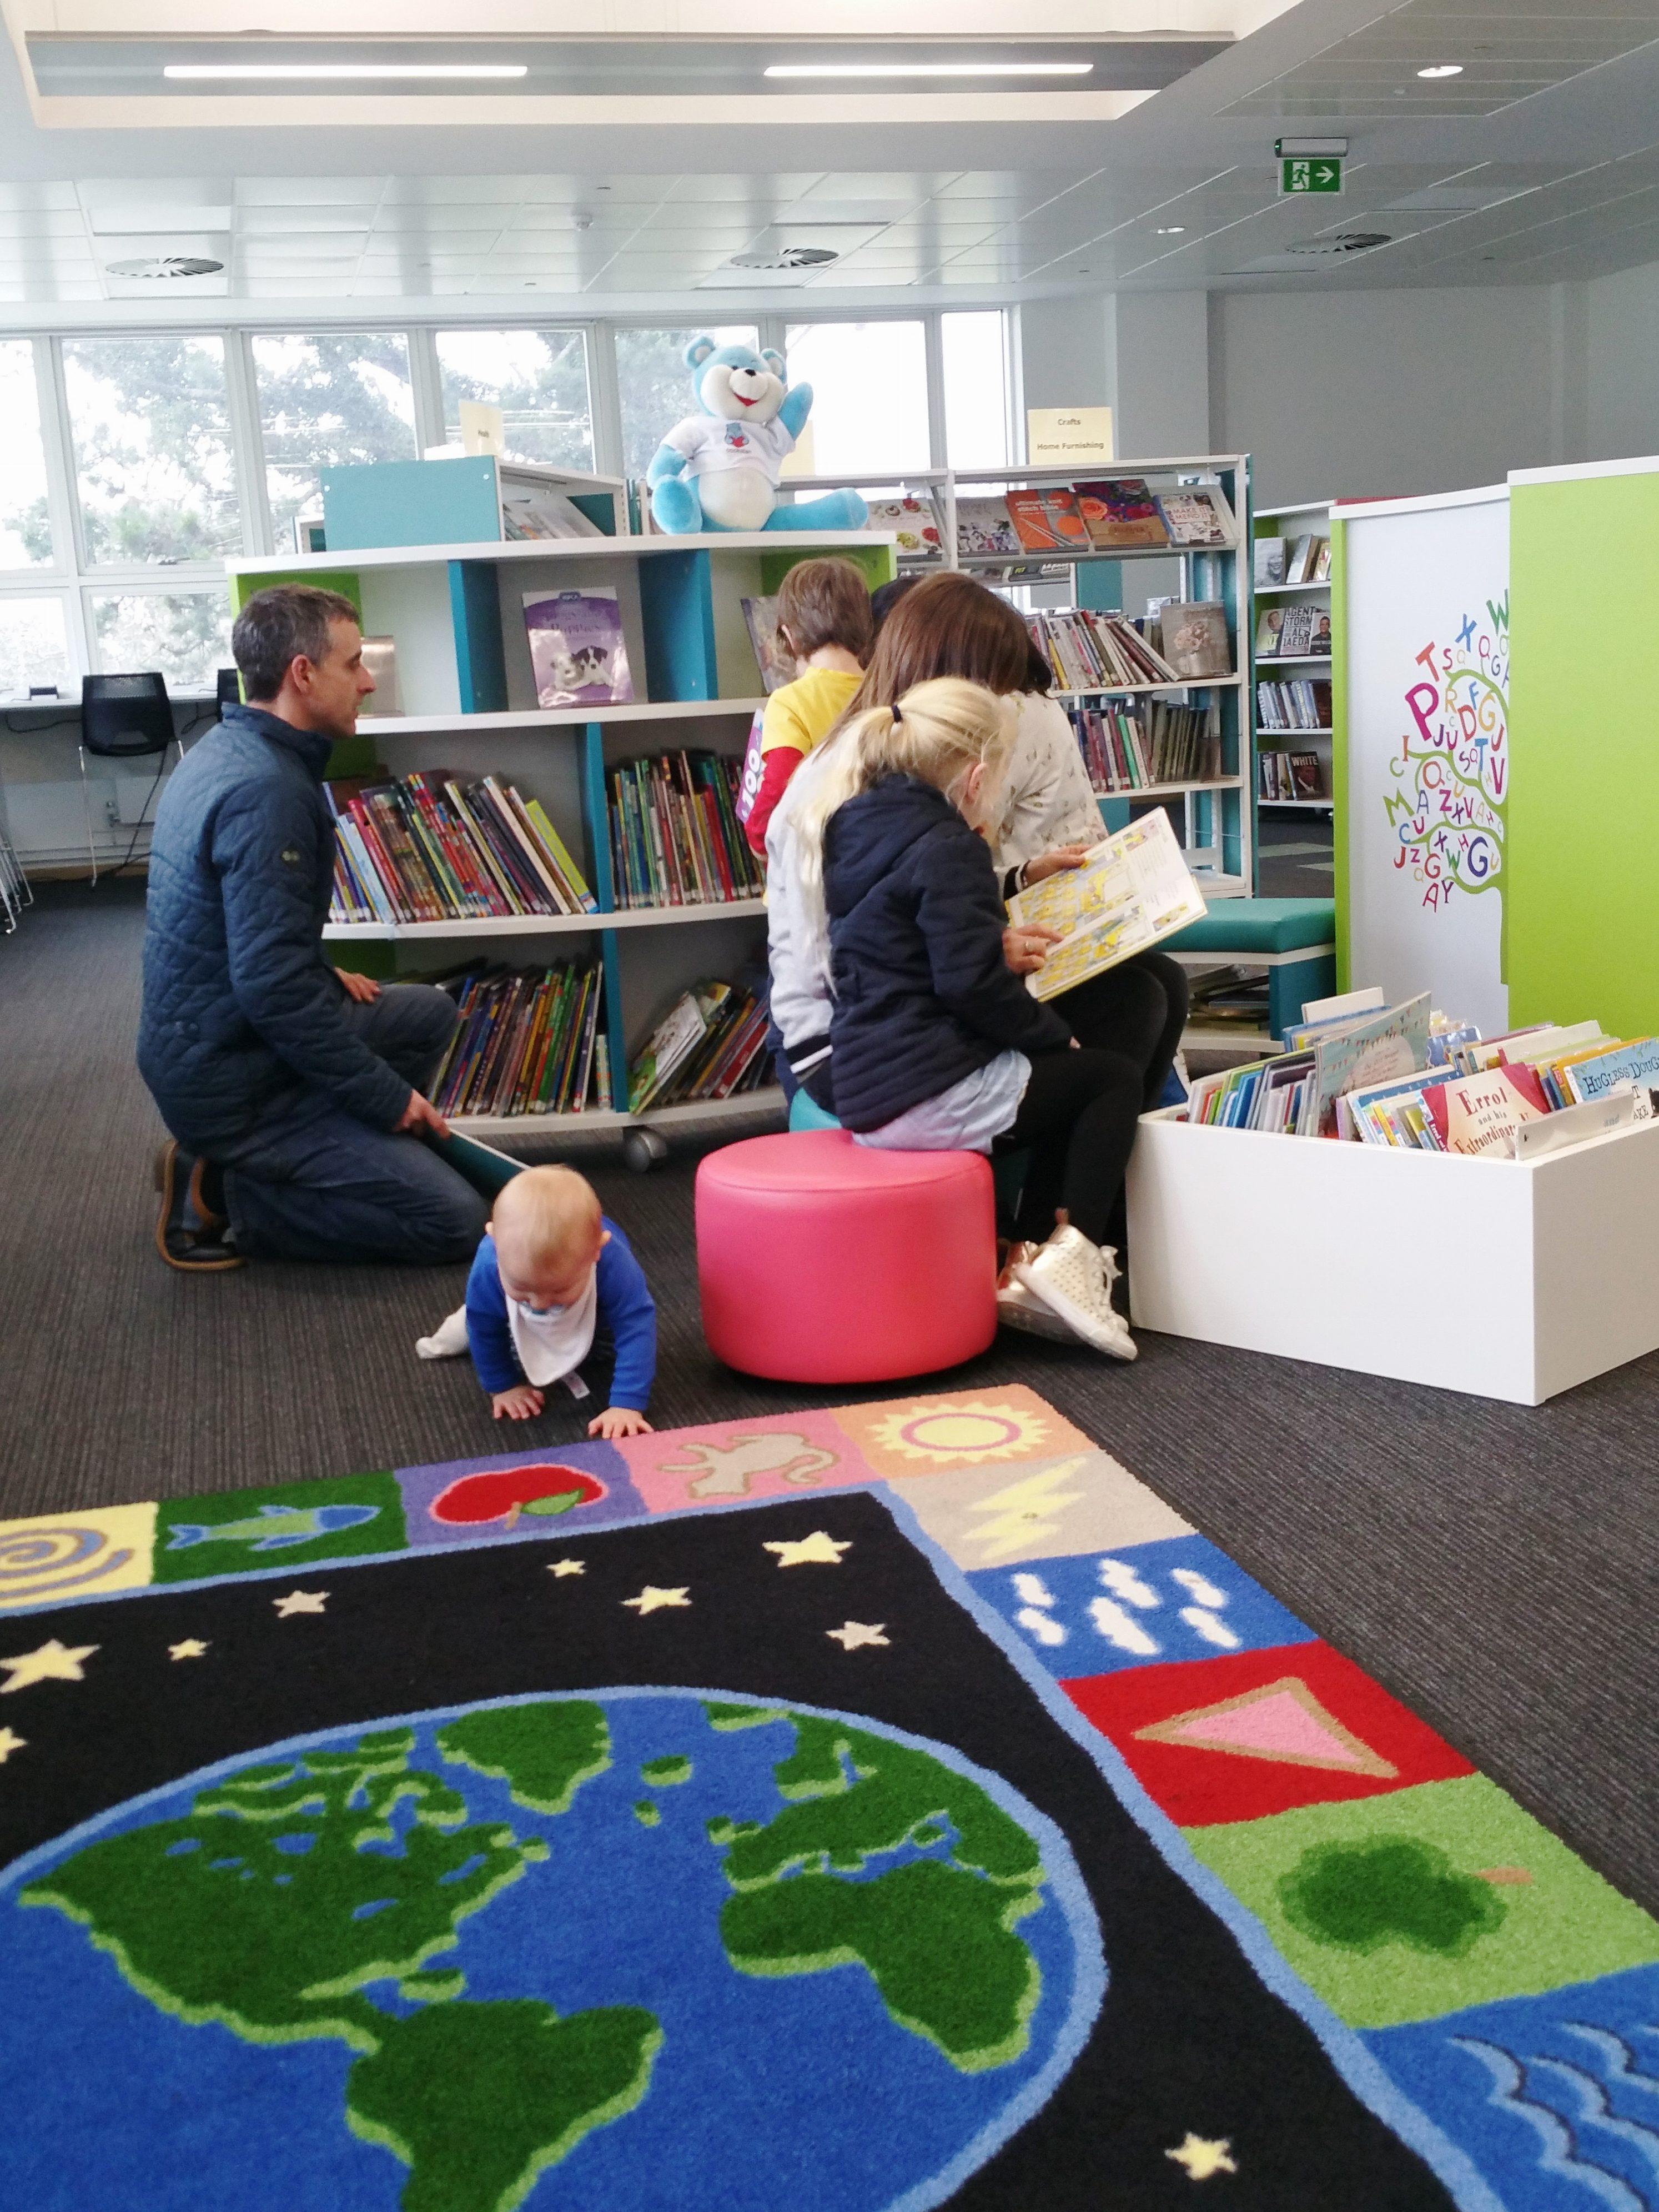 Garden Centre: Cornwall's Libraries: The Devolution Revolution Has Been